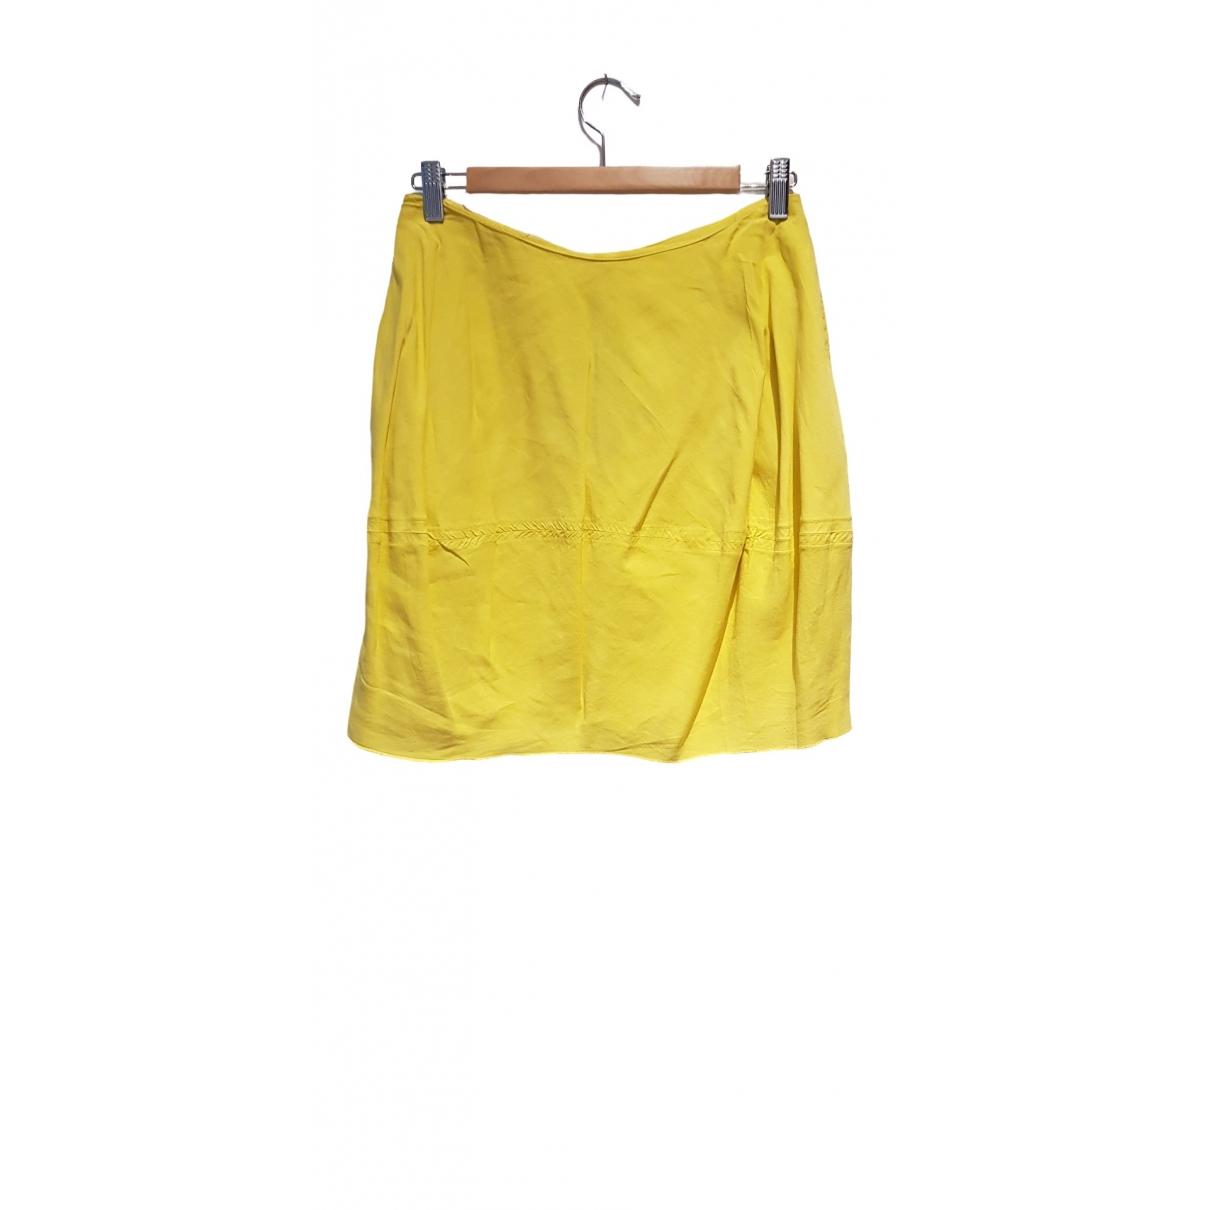 Marni \N Yellow skirt for Women 38 IT